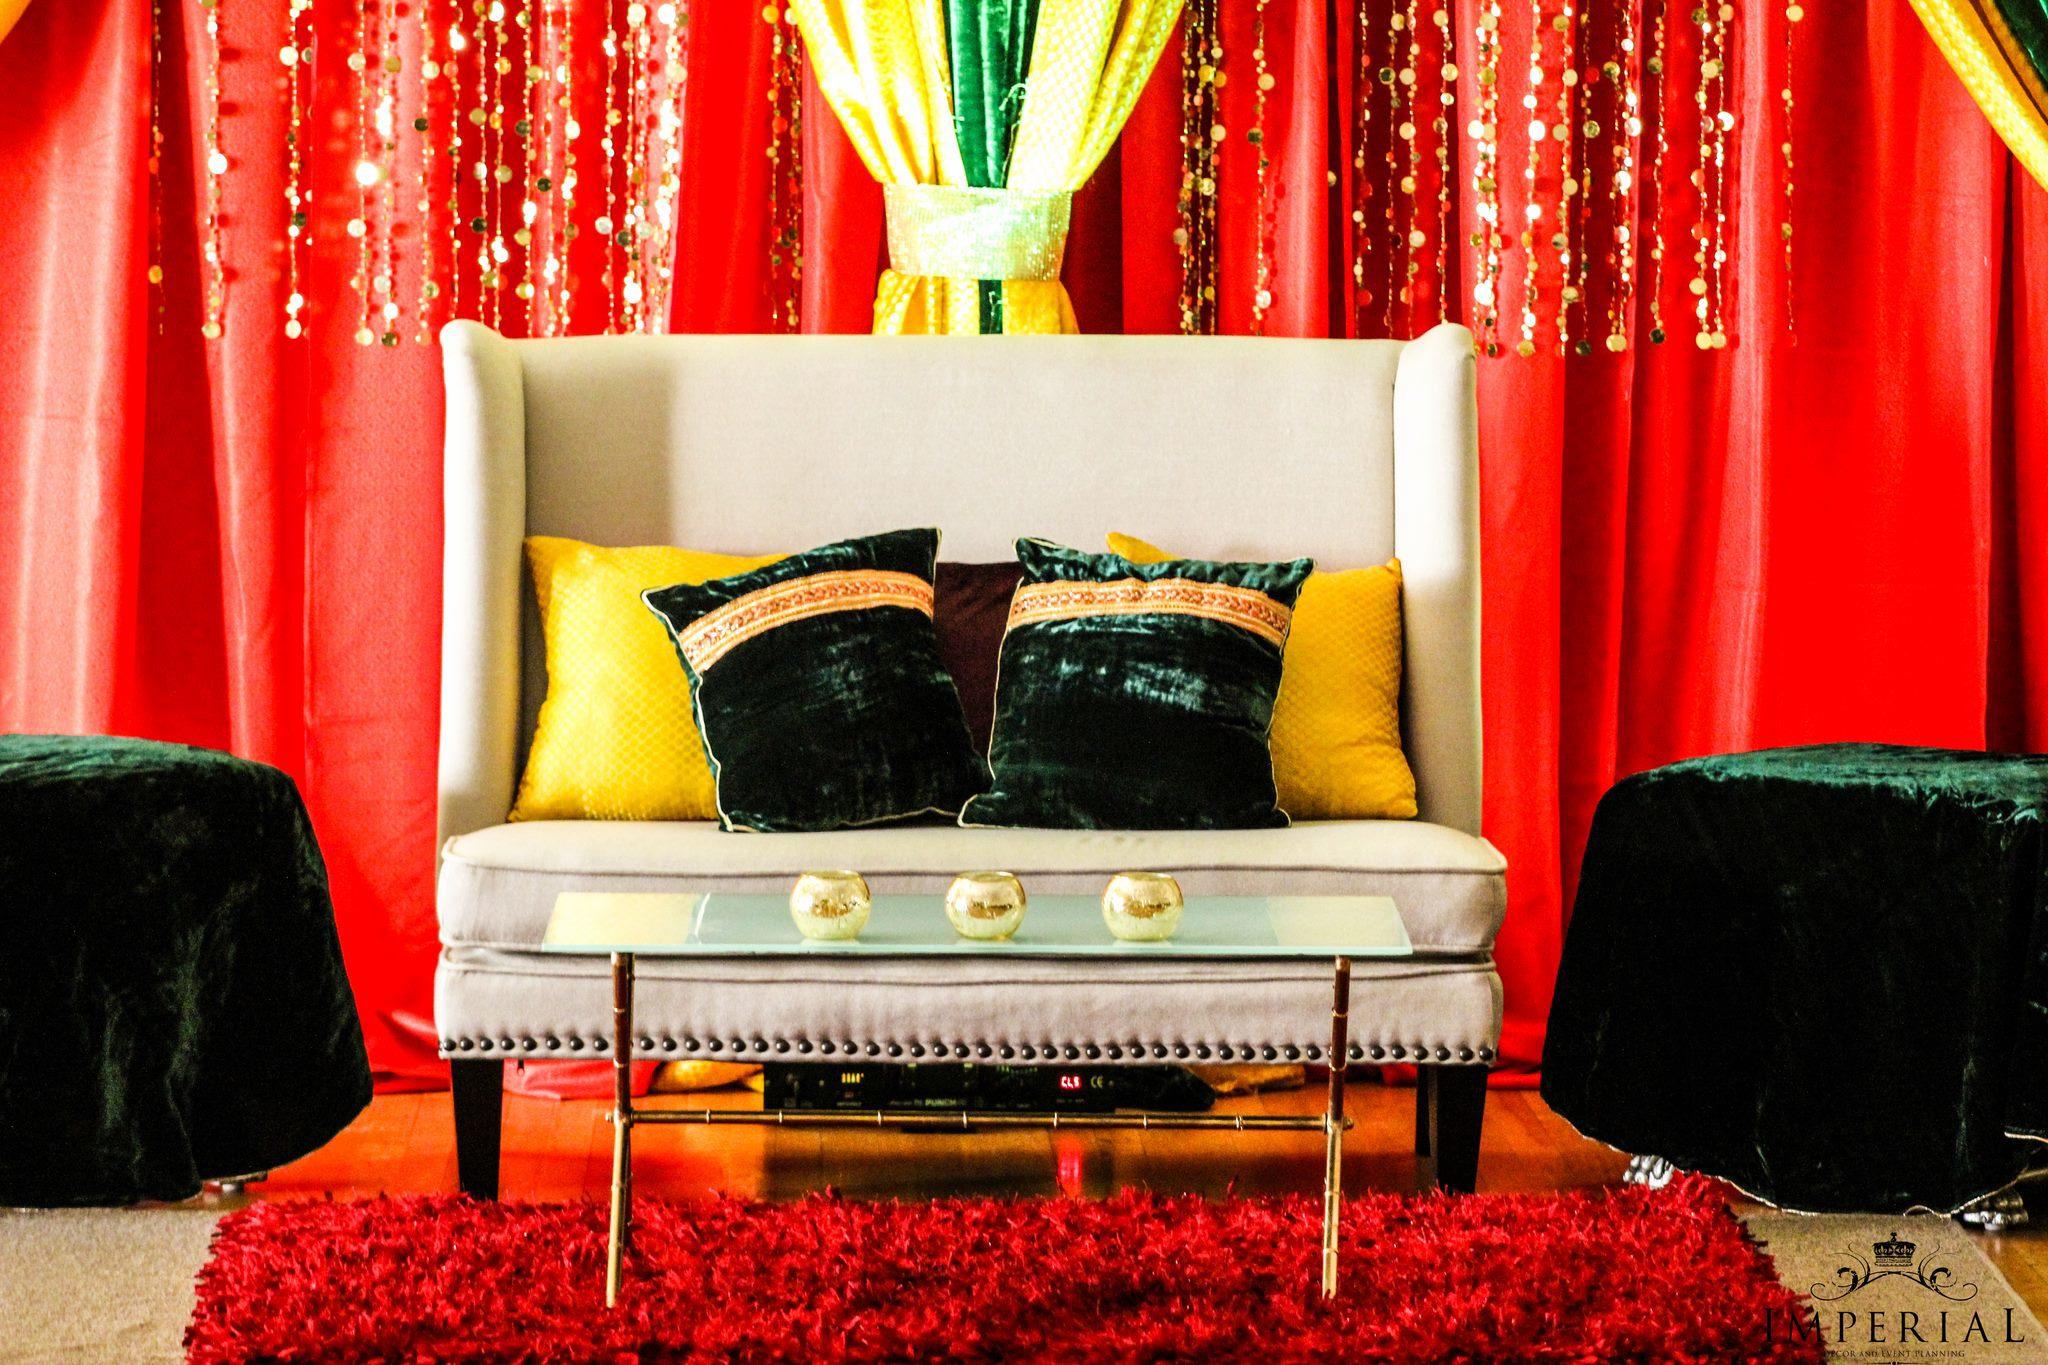 Imperial Decorations - Indian Wedding Mehndi Stage Designs.jpg .jpg